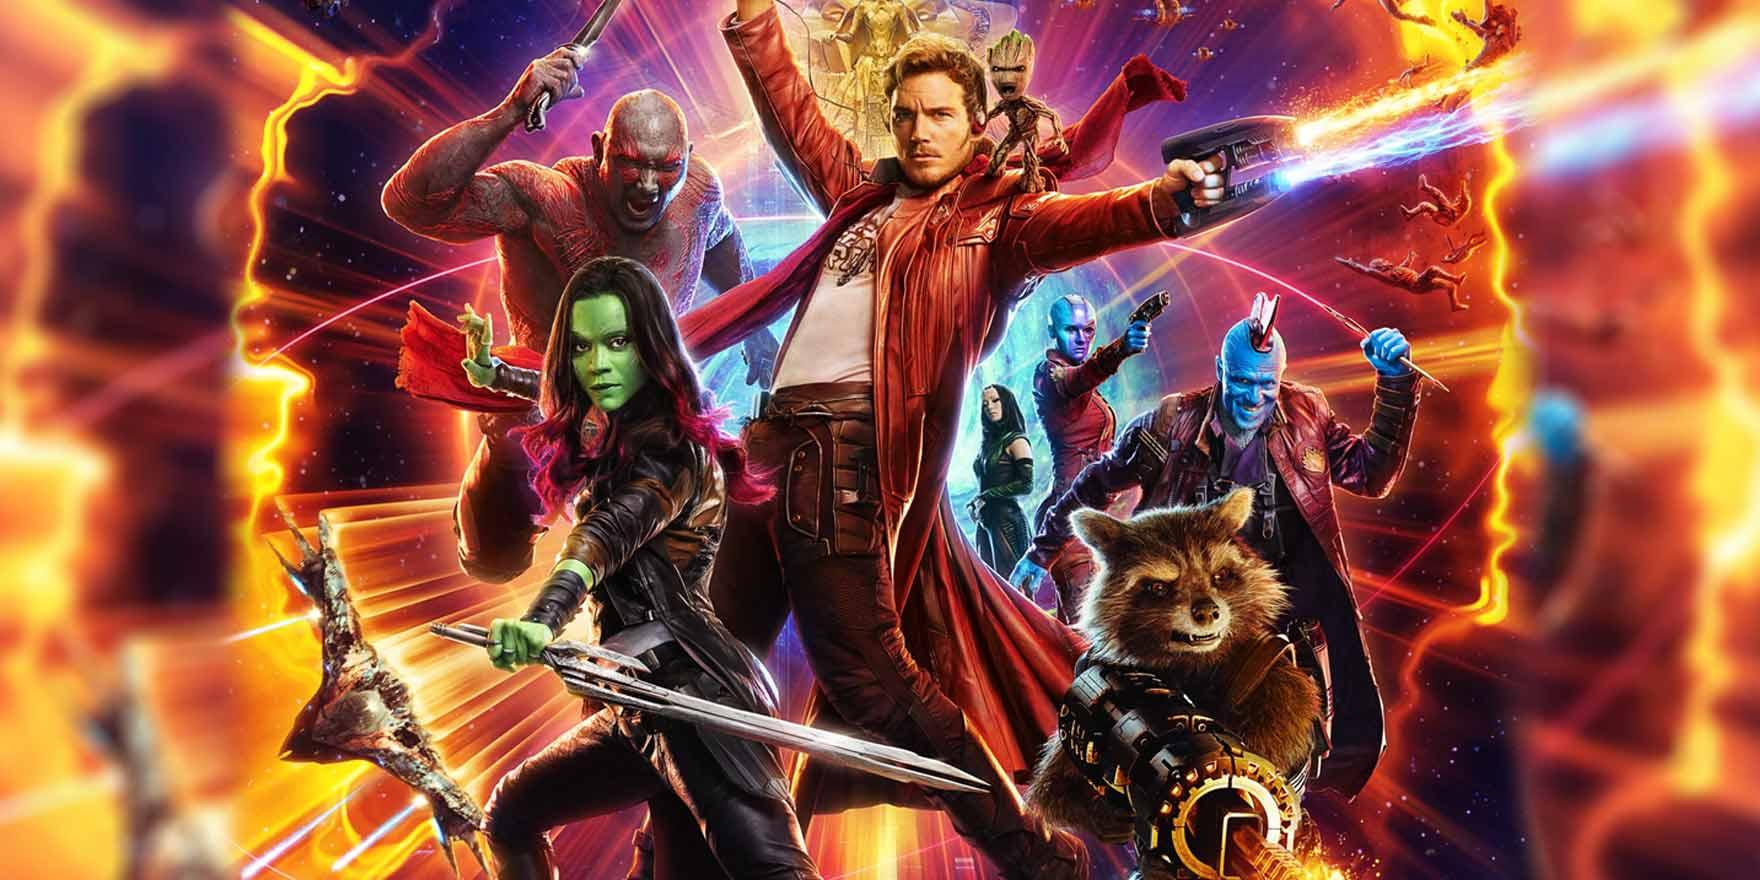 Guardians of the Galaxy Vol. 2 - Header Image